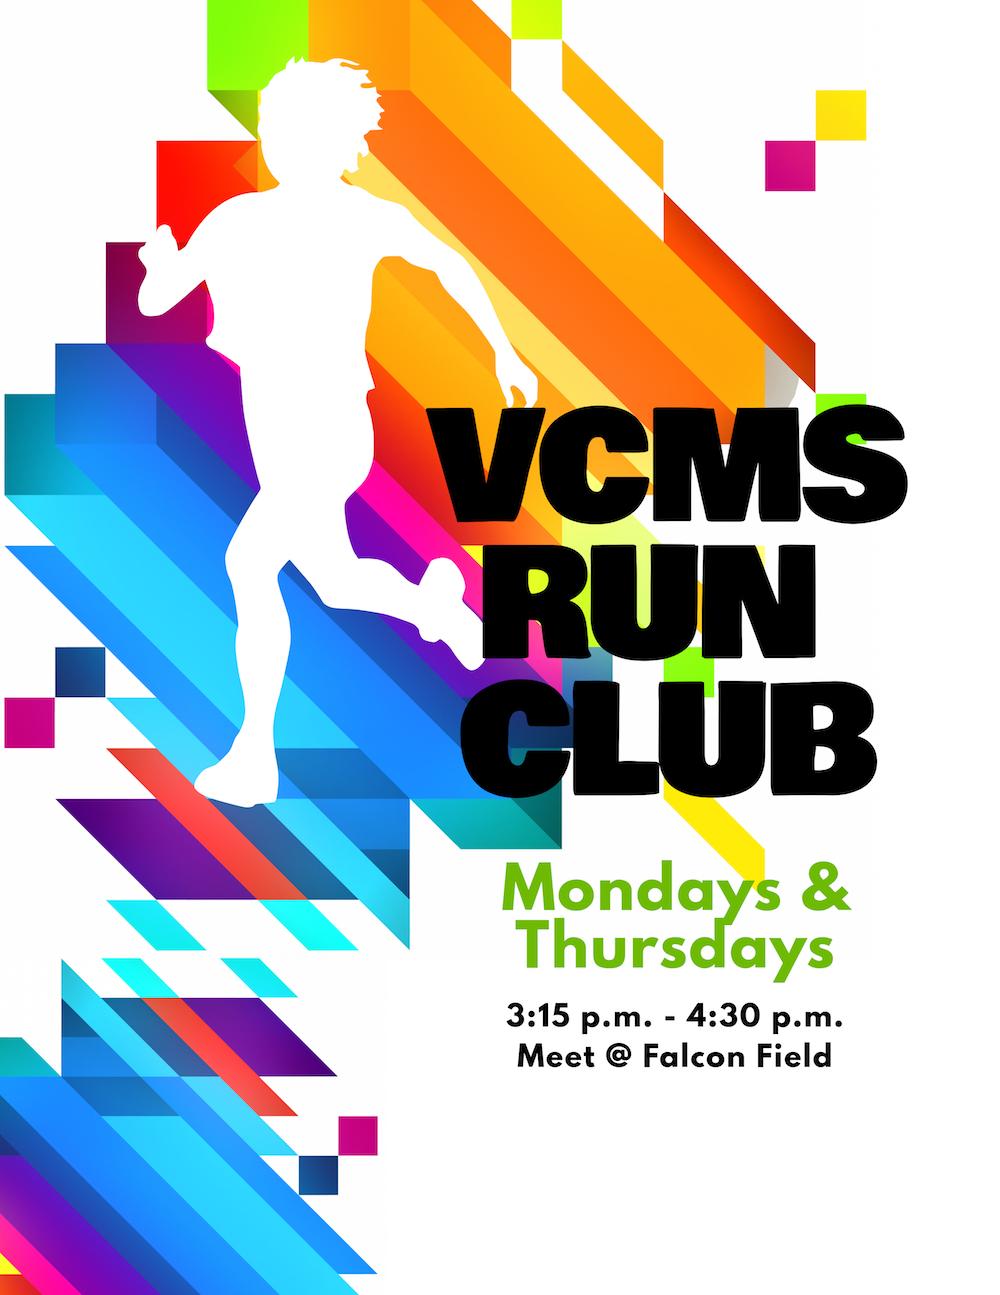 vcms run club